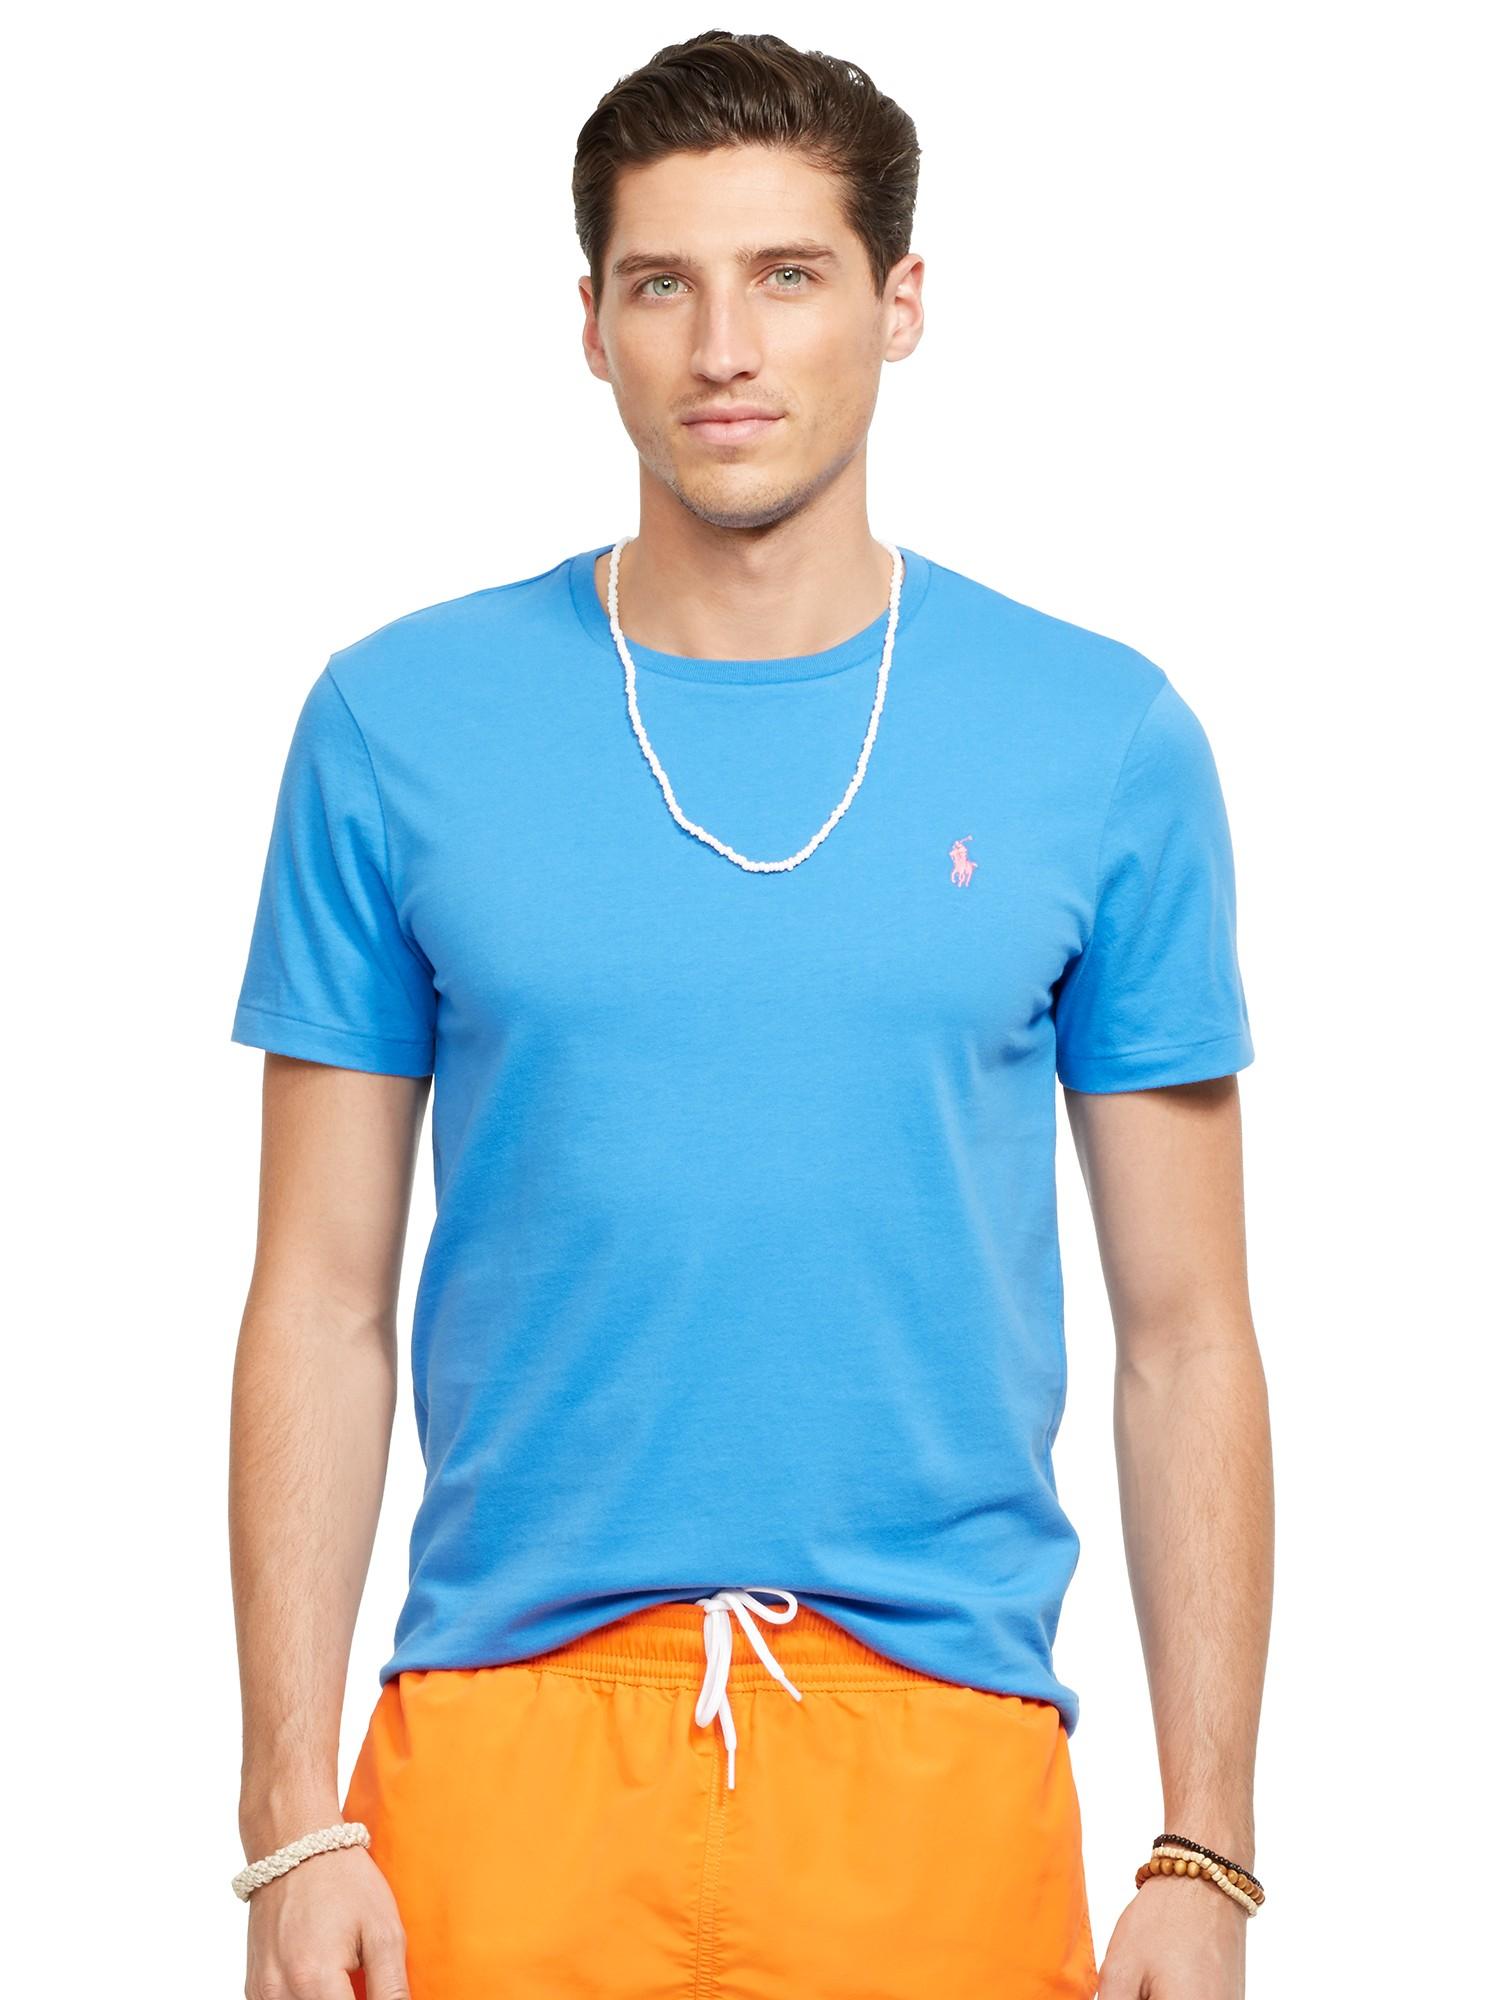 polo ralph lauren basic custom fit t shirt in blue for men. Black Bedroom Furniture Sets. Home Design Ideas